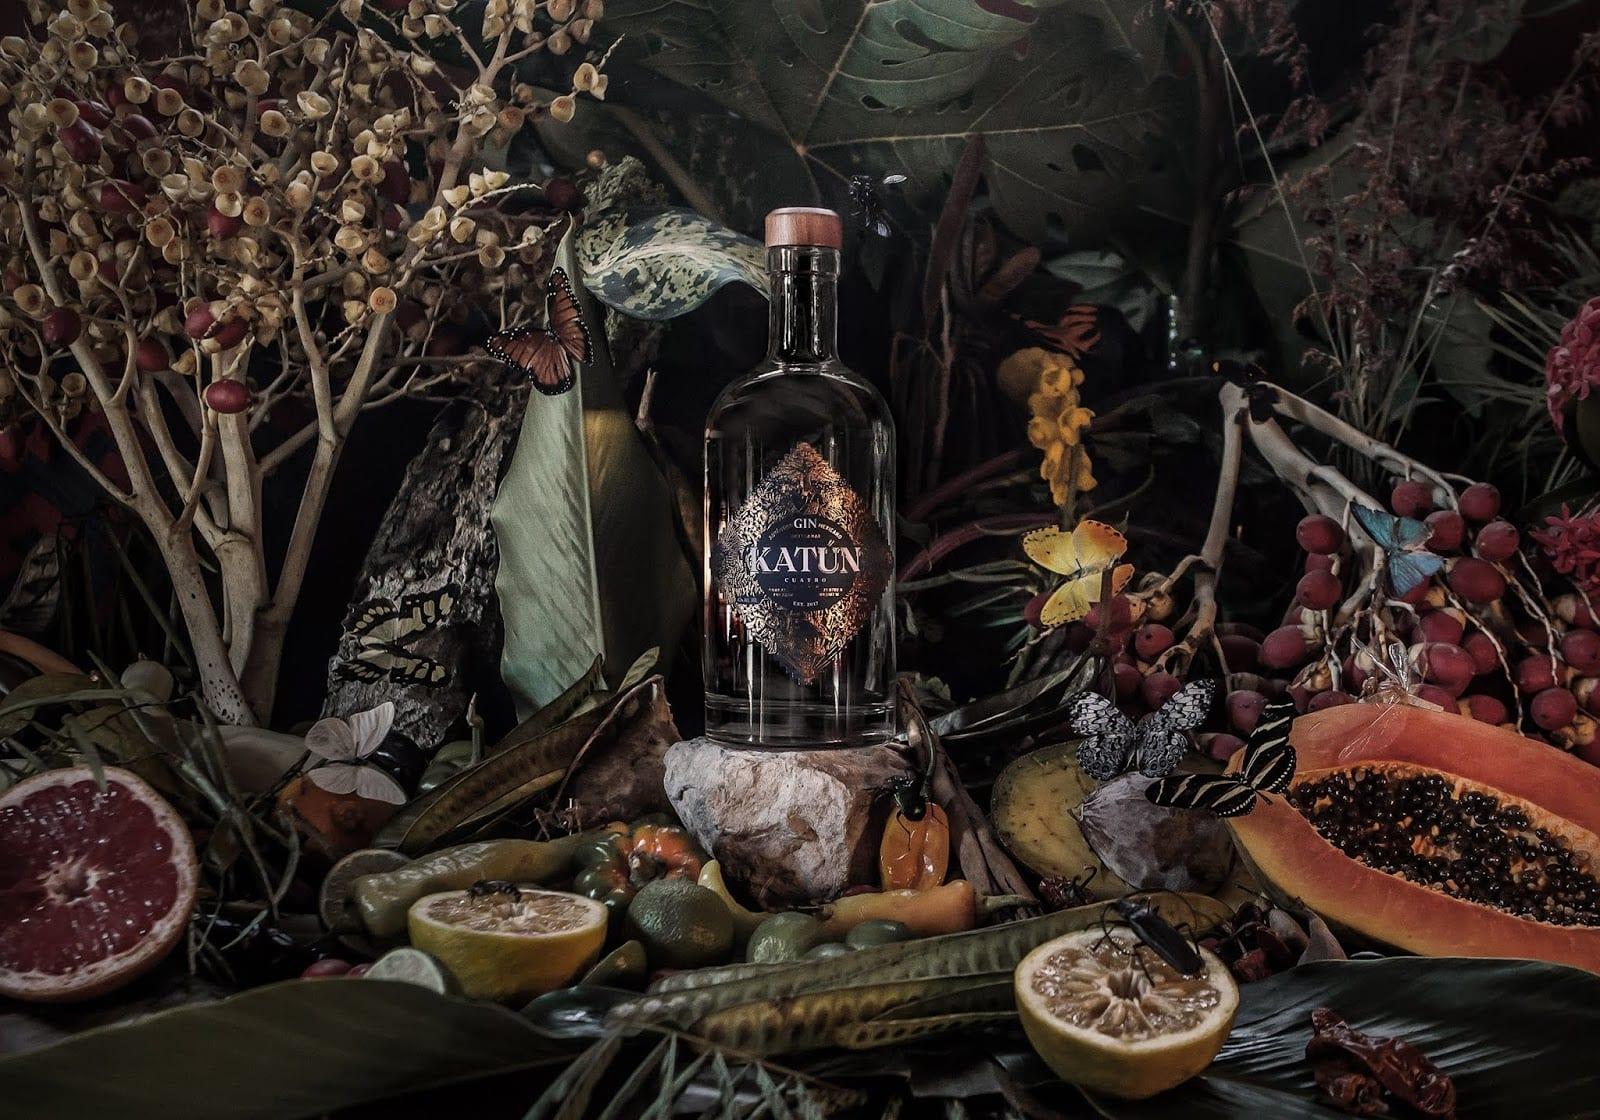 katun 01 - Ach, tie obaly – Gin Katun 4